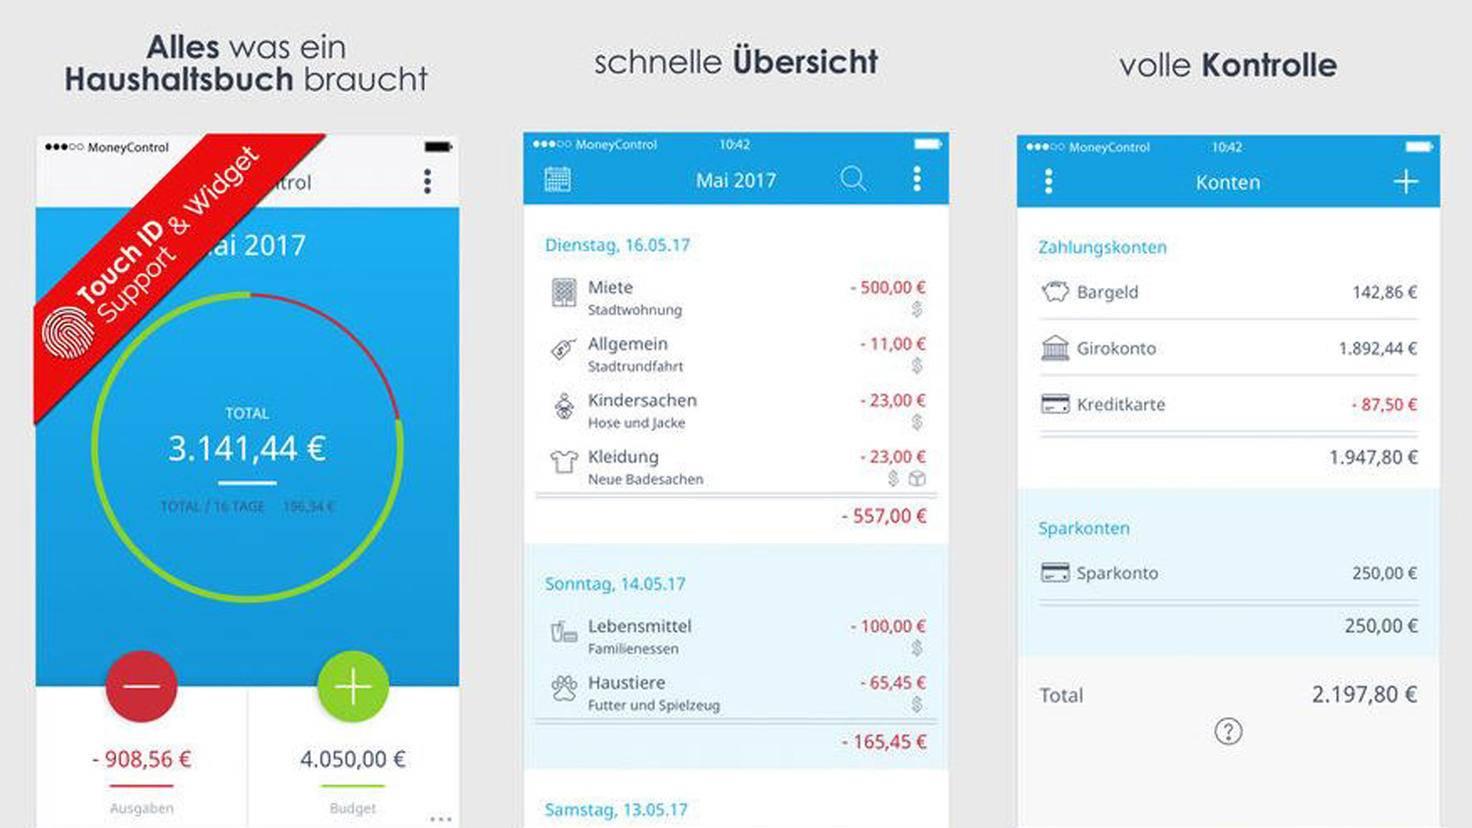 Haushaltsbuch-App MoneyControl